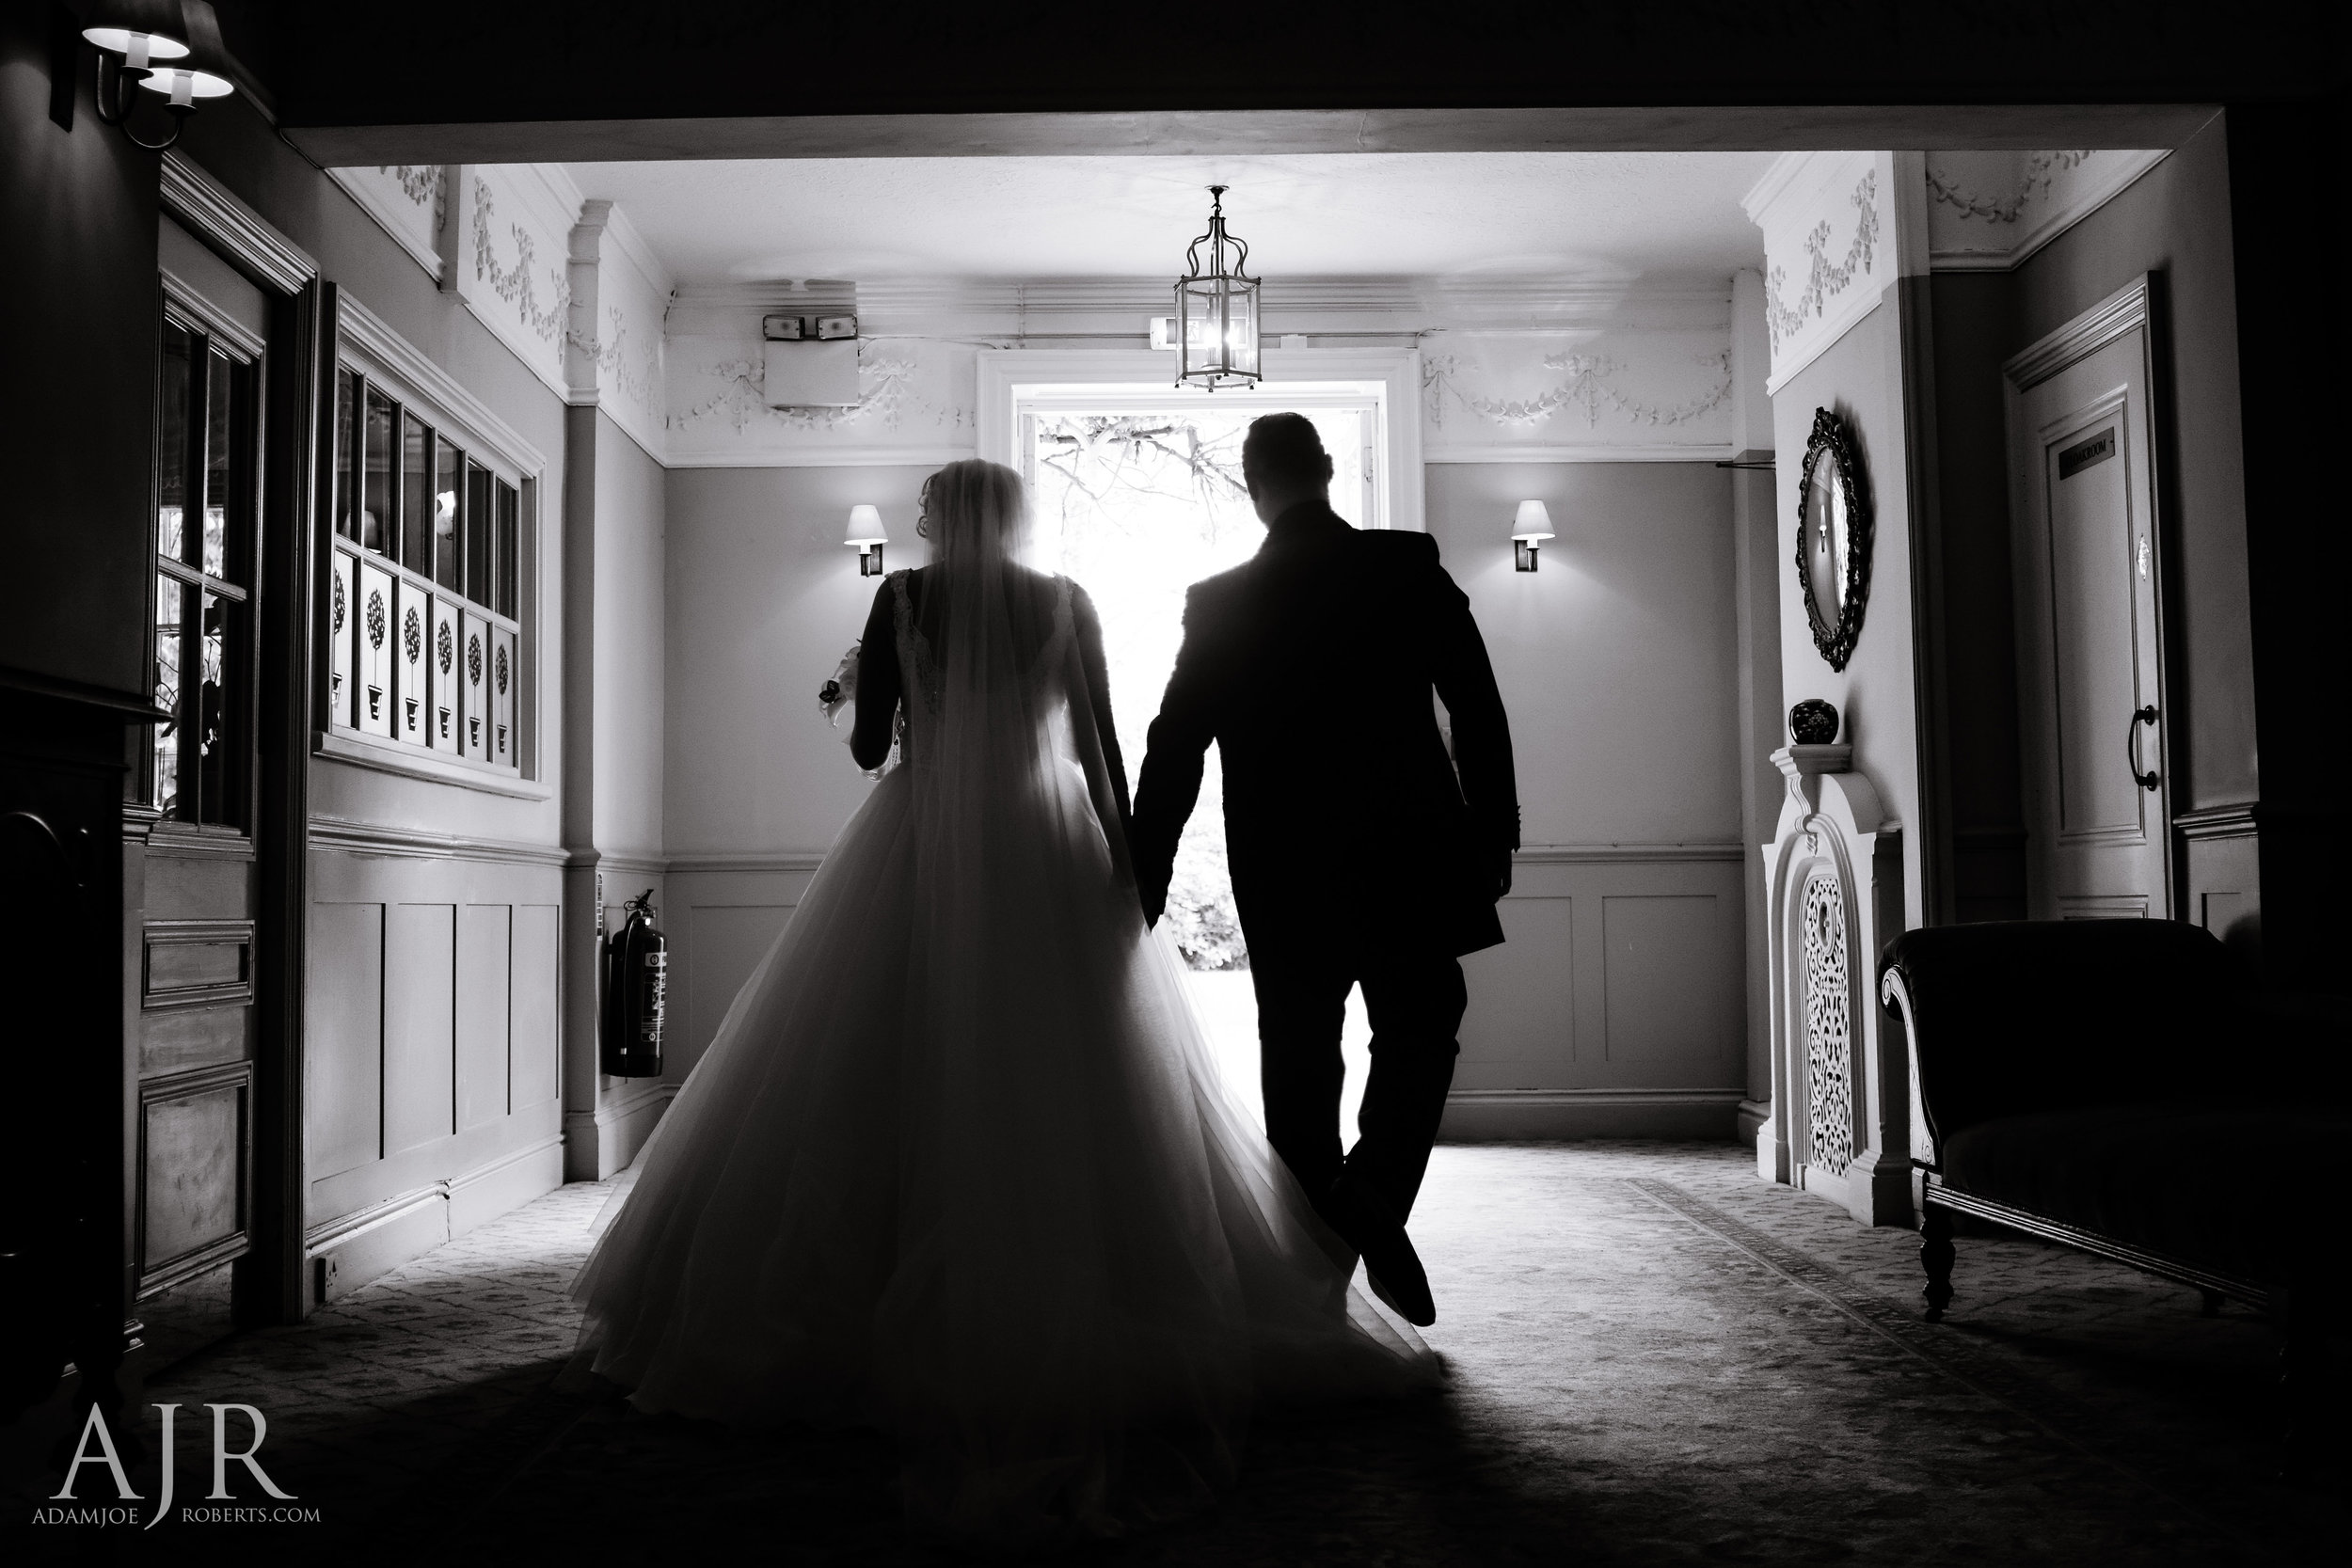 statham lodge wedding photographer cheshire wedding photographer (9 of 11).jpg